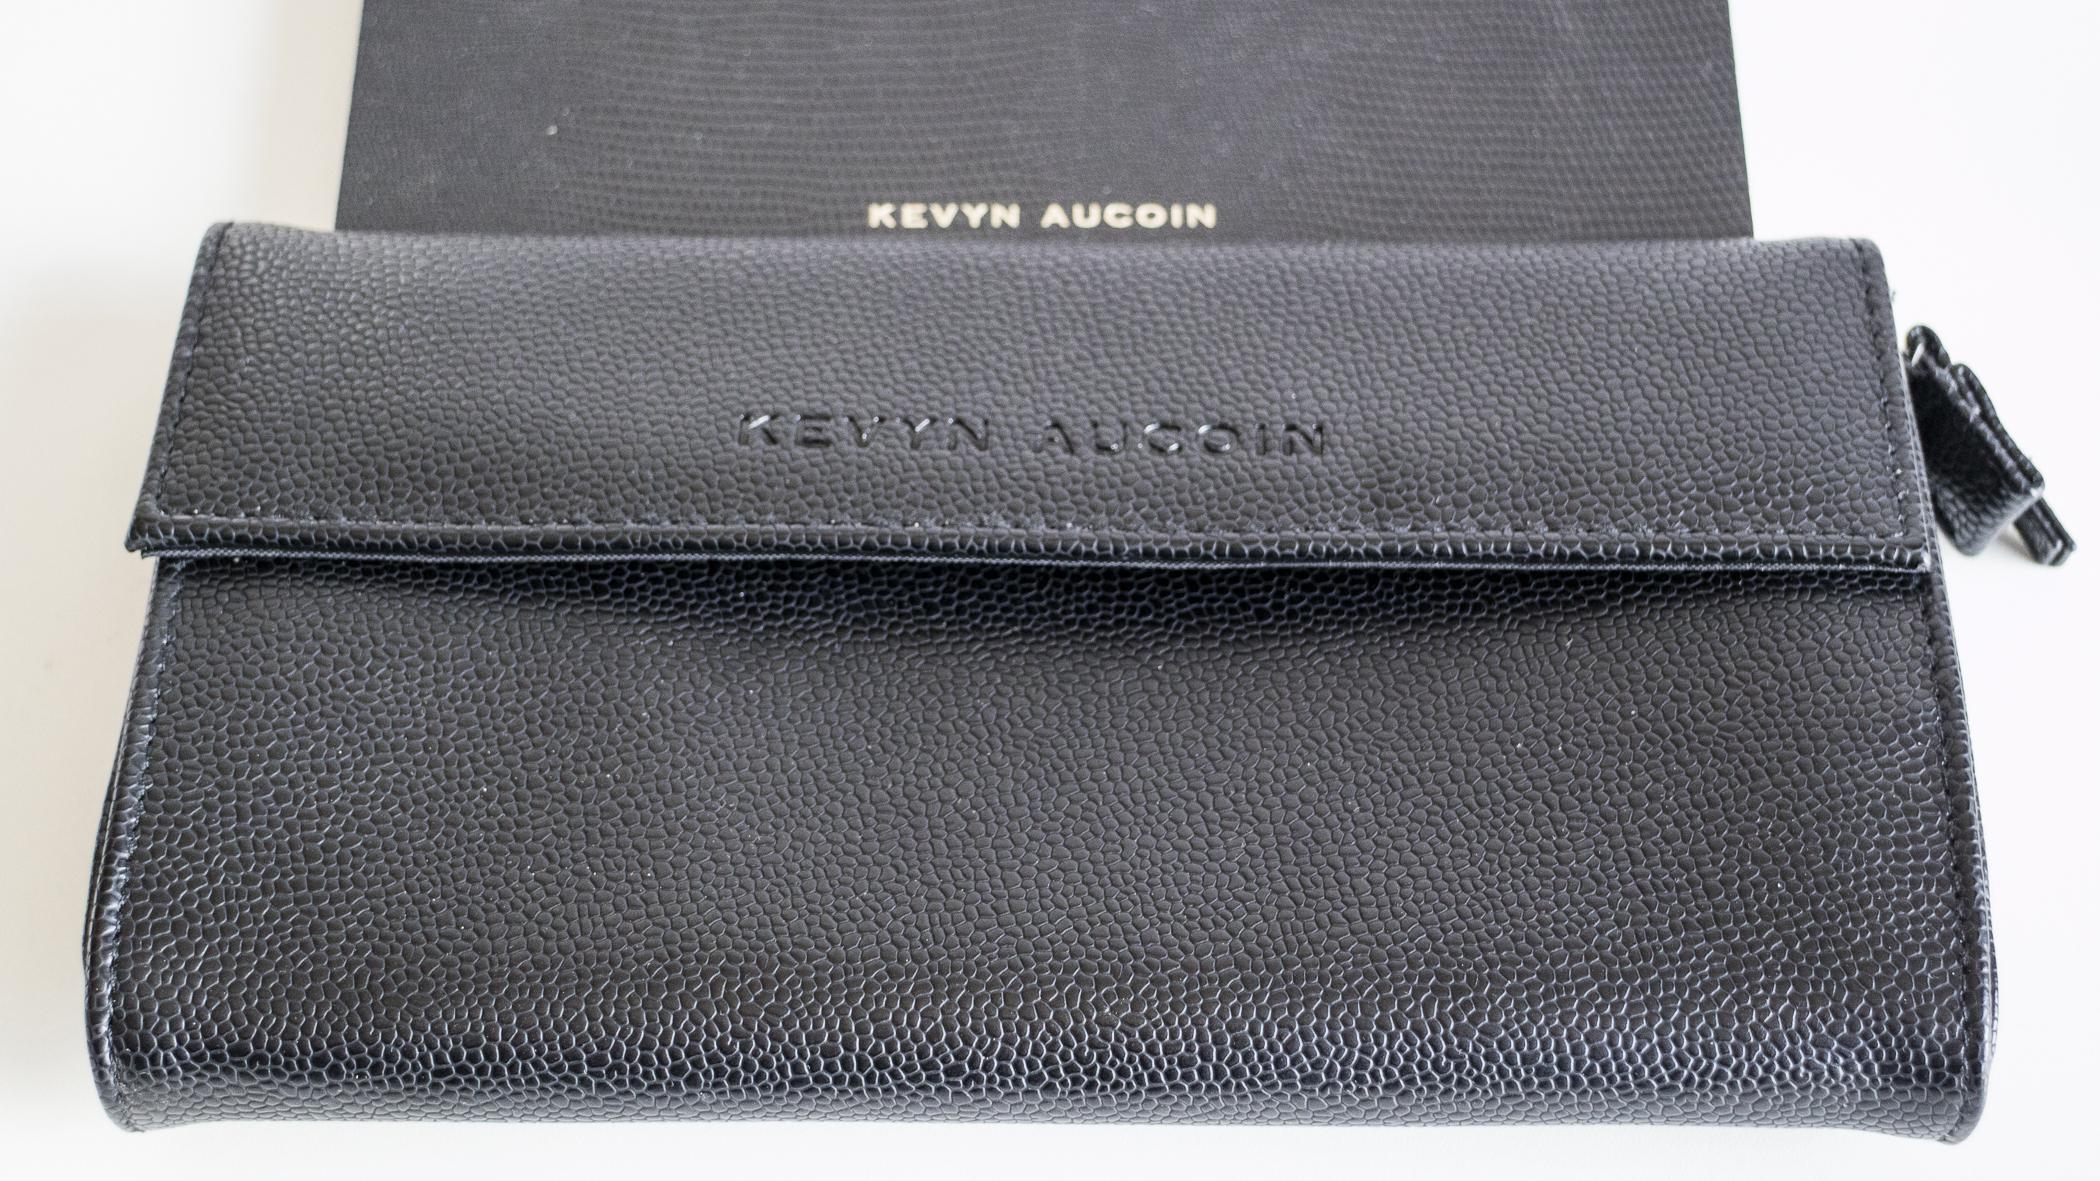 Kevyn Aucoin The Legacy Palette Clutch